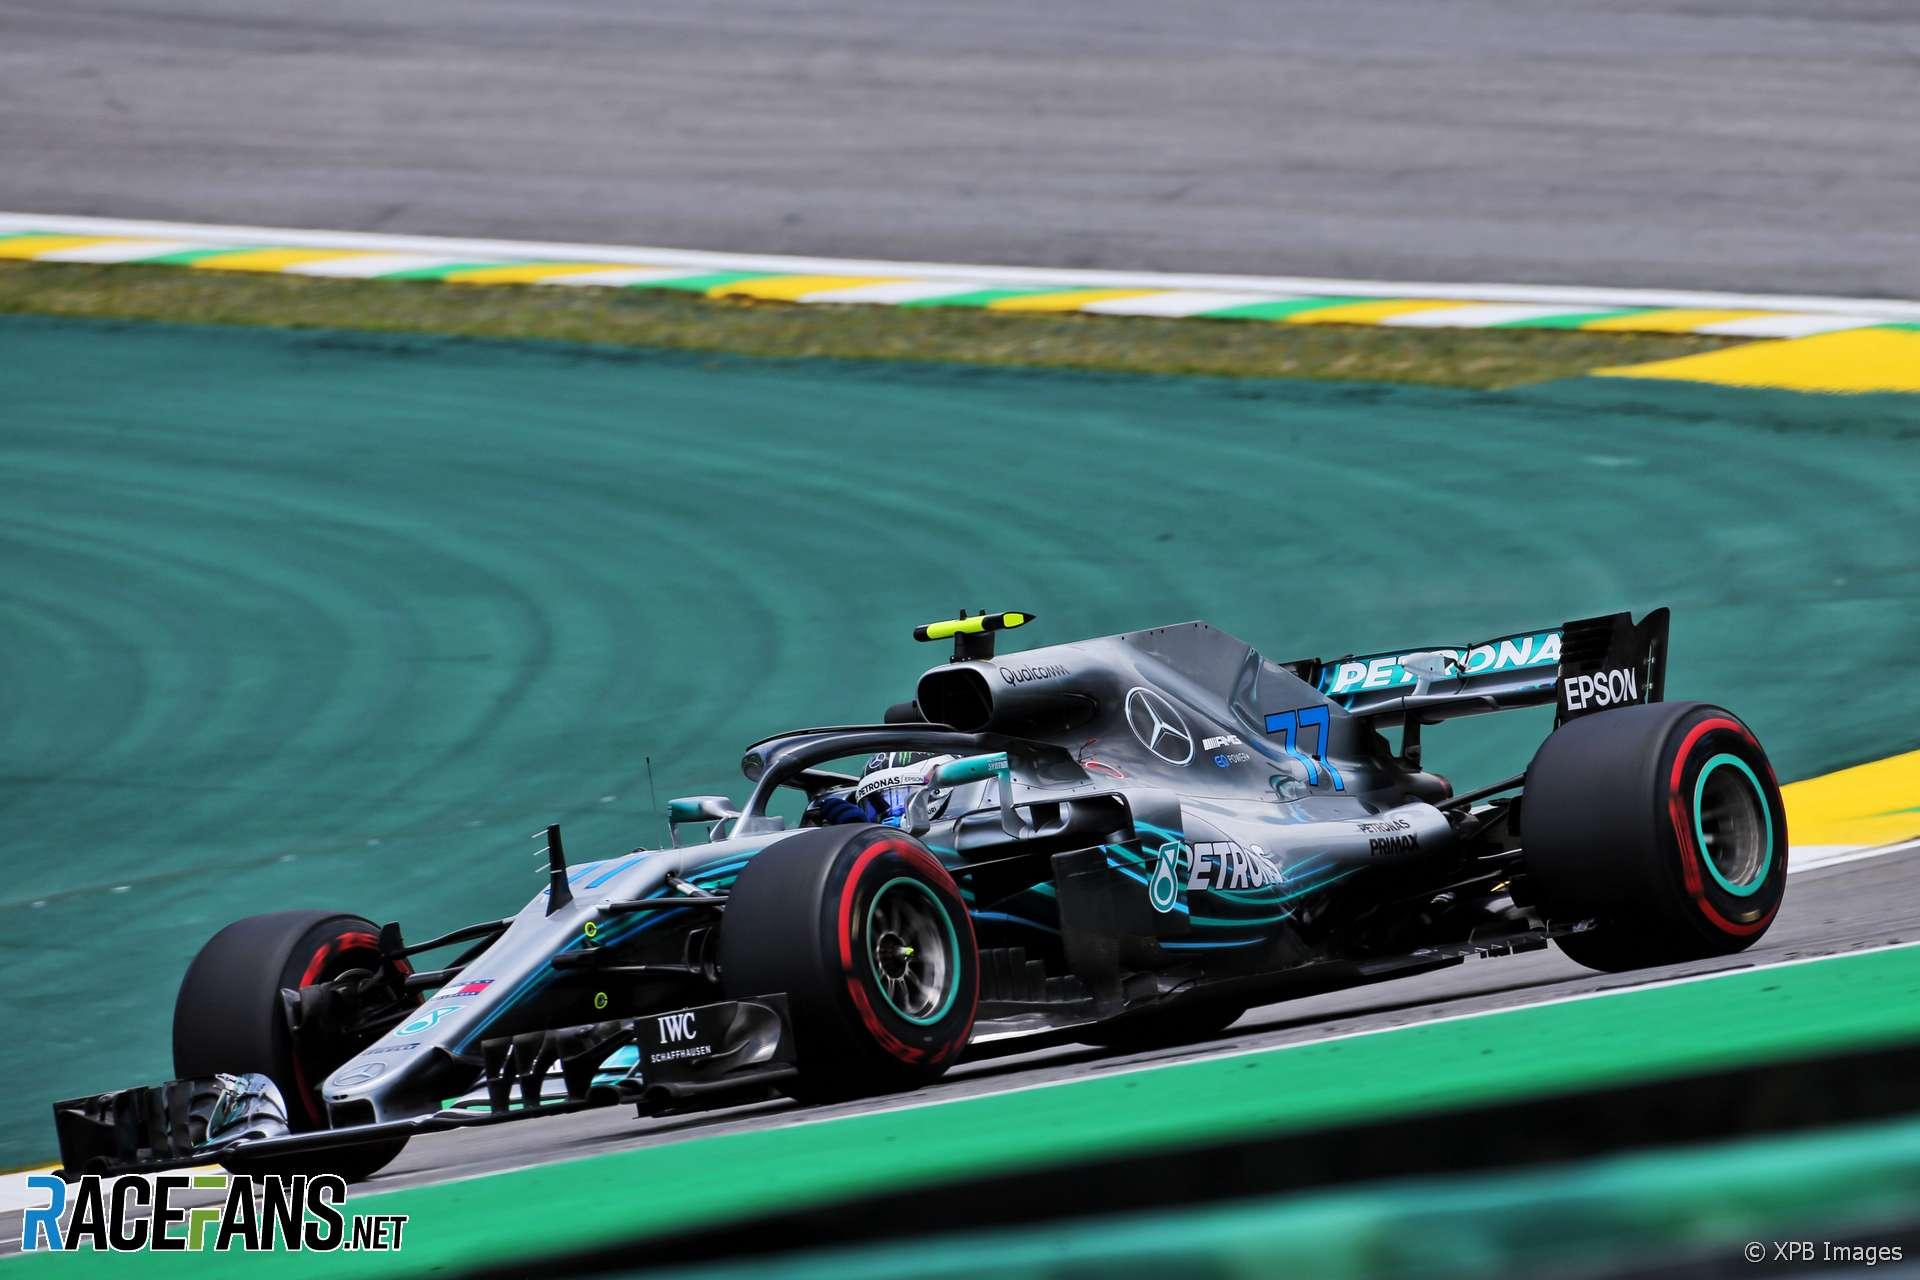 Valtteri Bottas, Mercedes, Interlagos, 2018